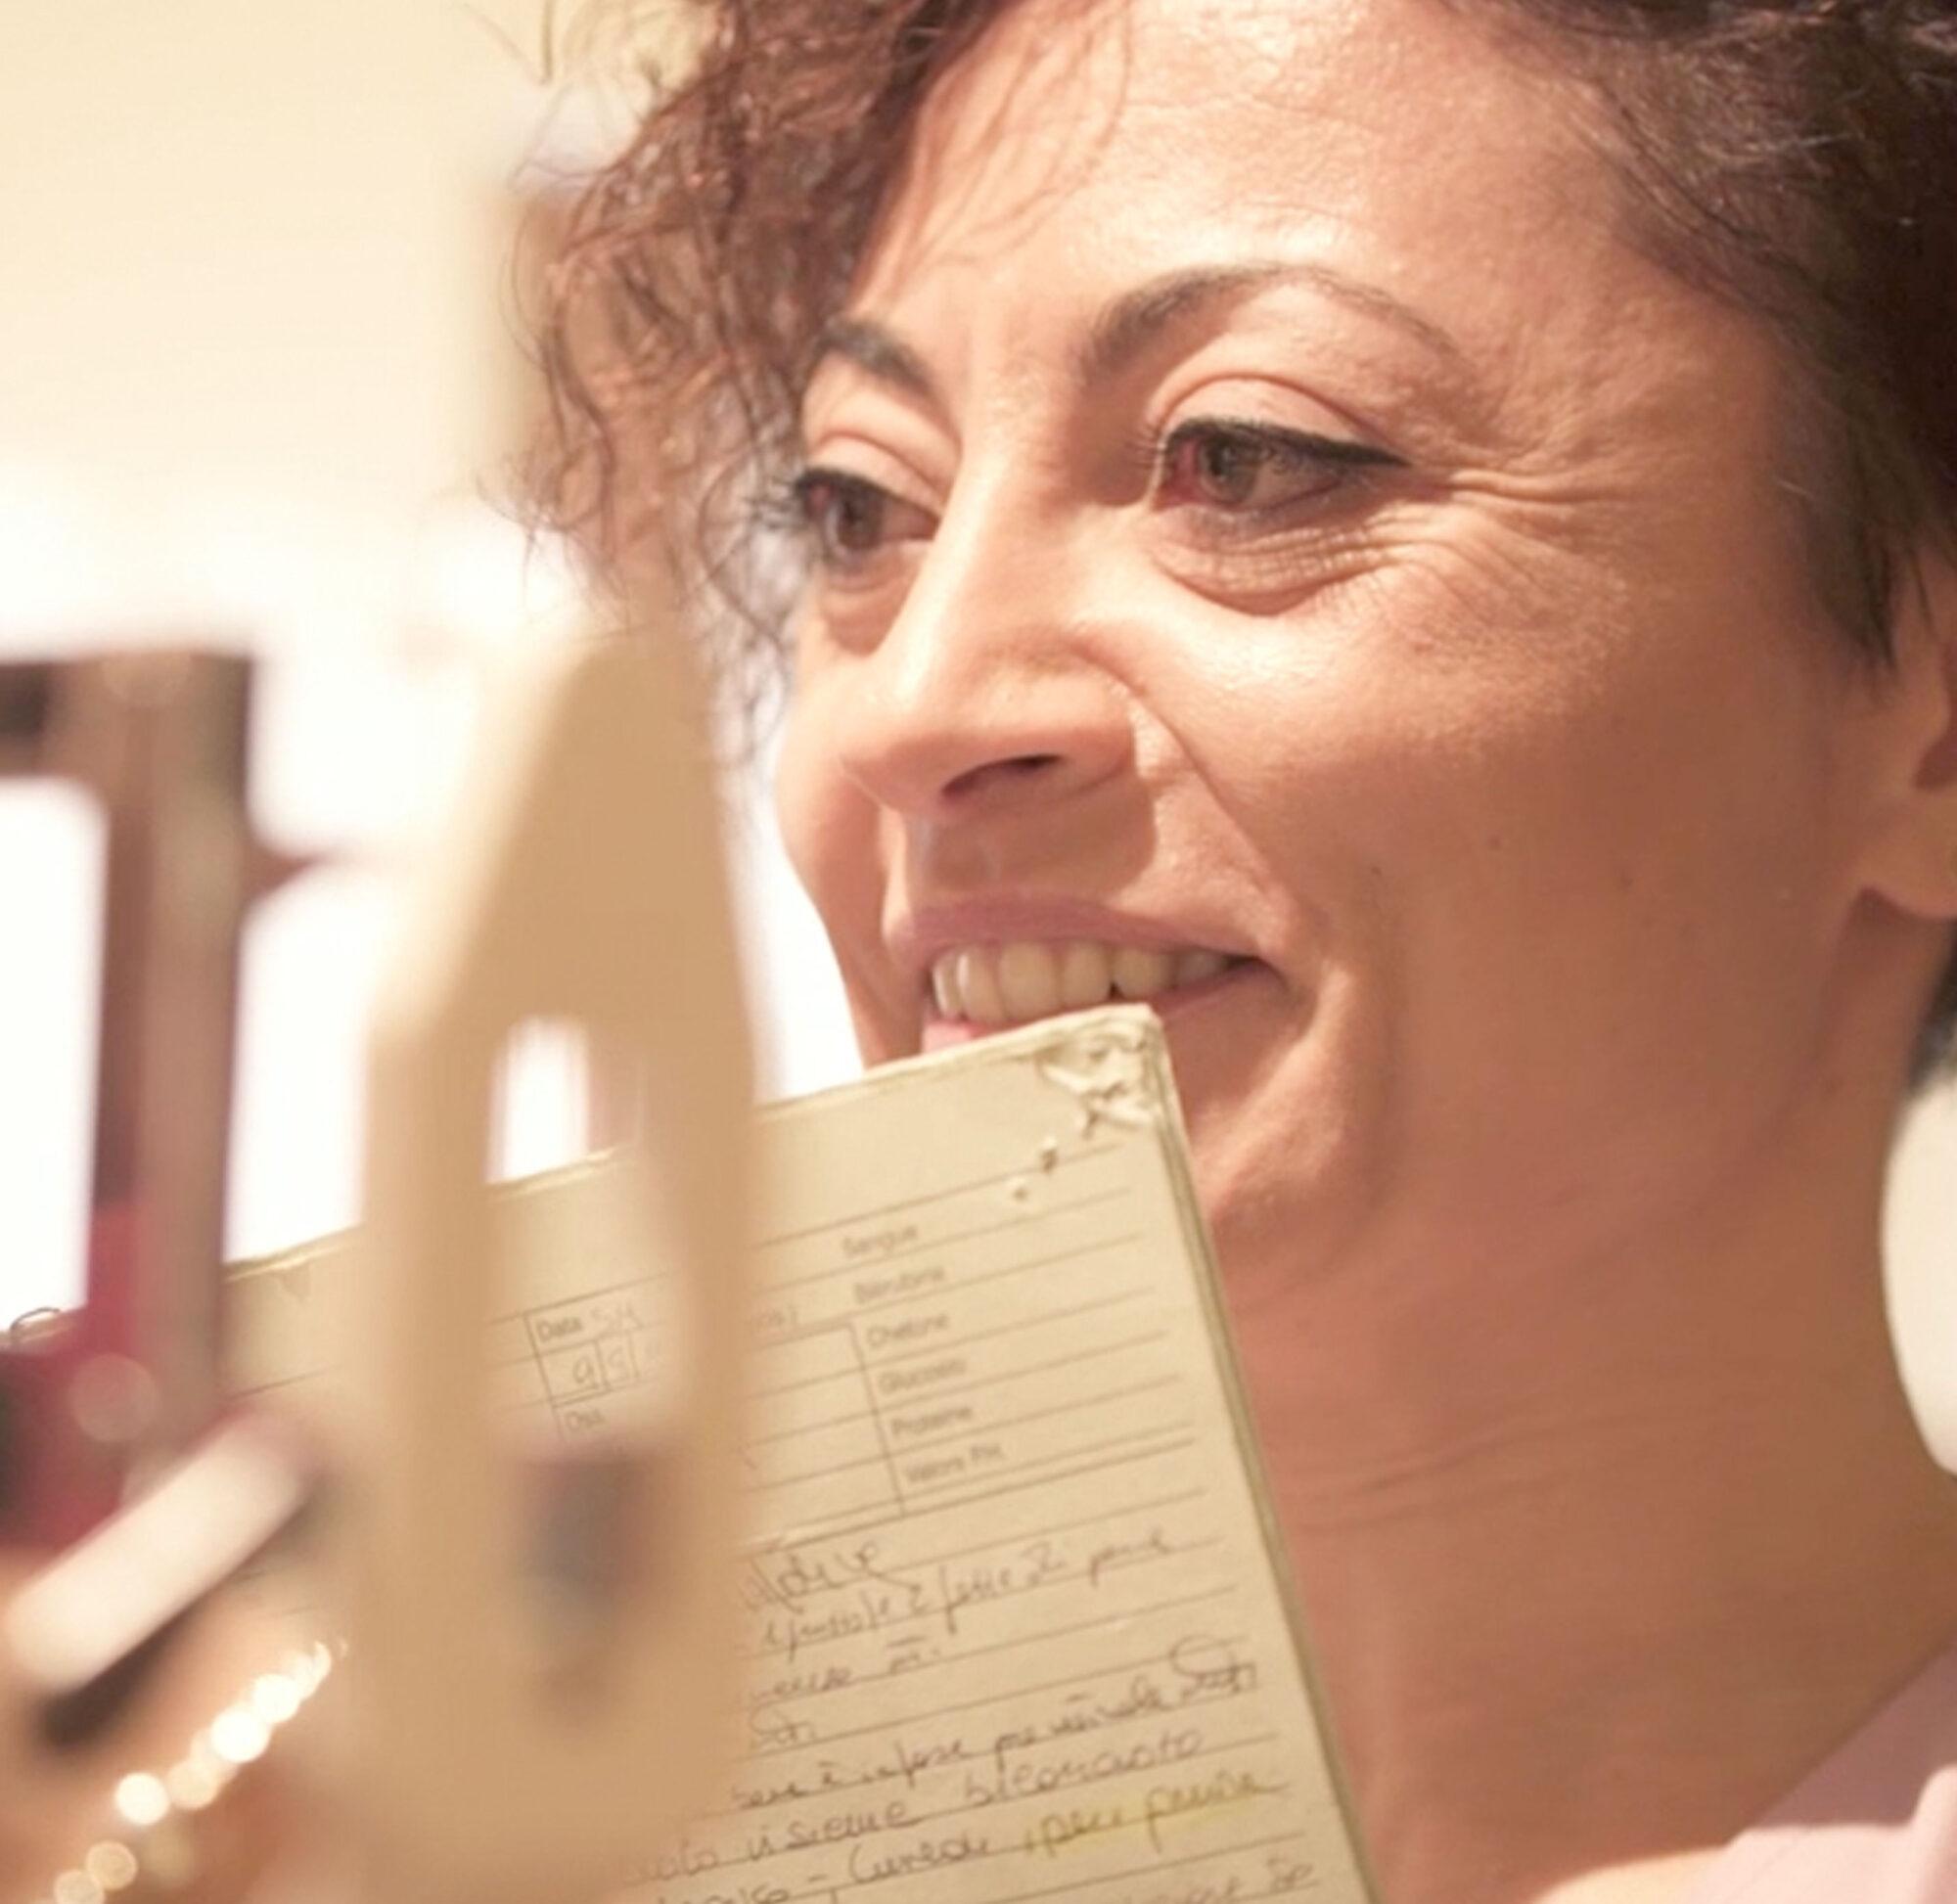 maria teresa Magrella Ferrara ricette light leggere dieta centro dimagrimento